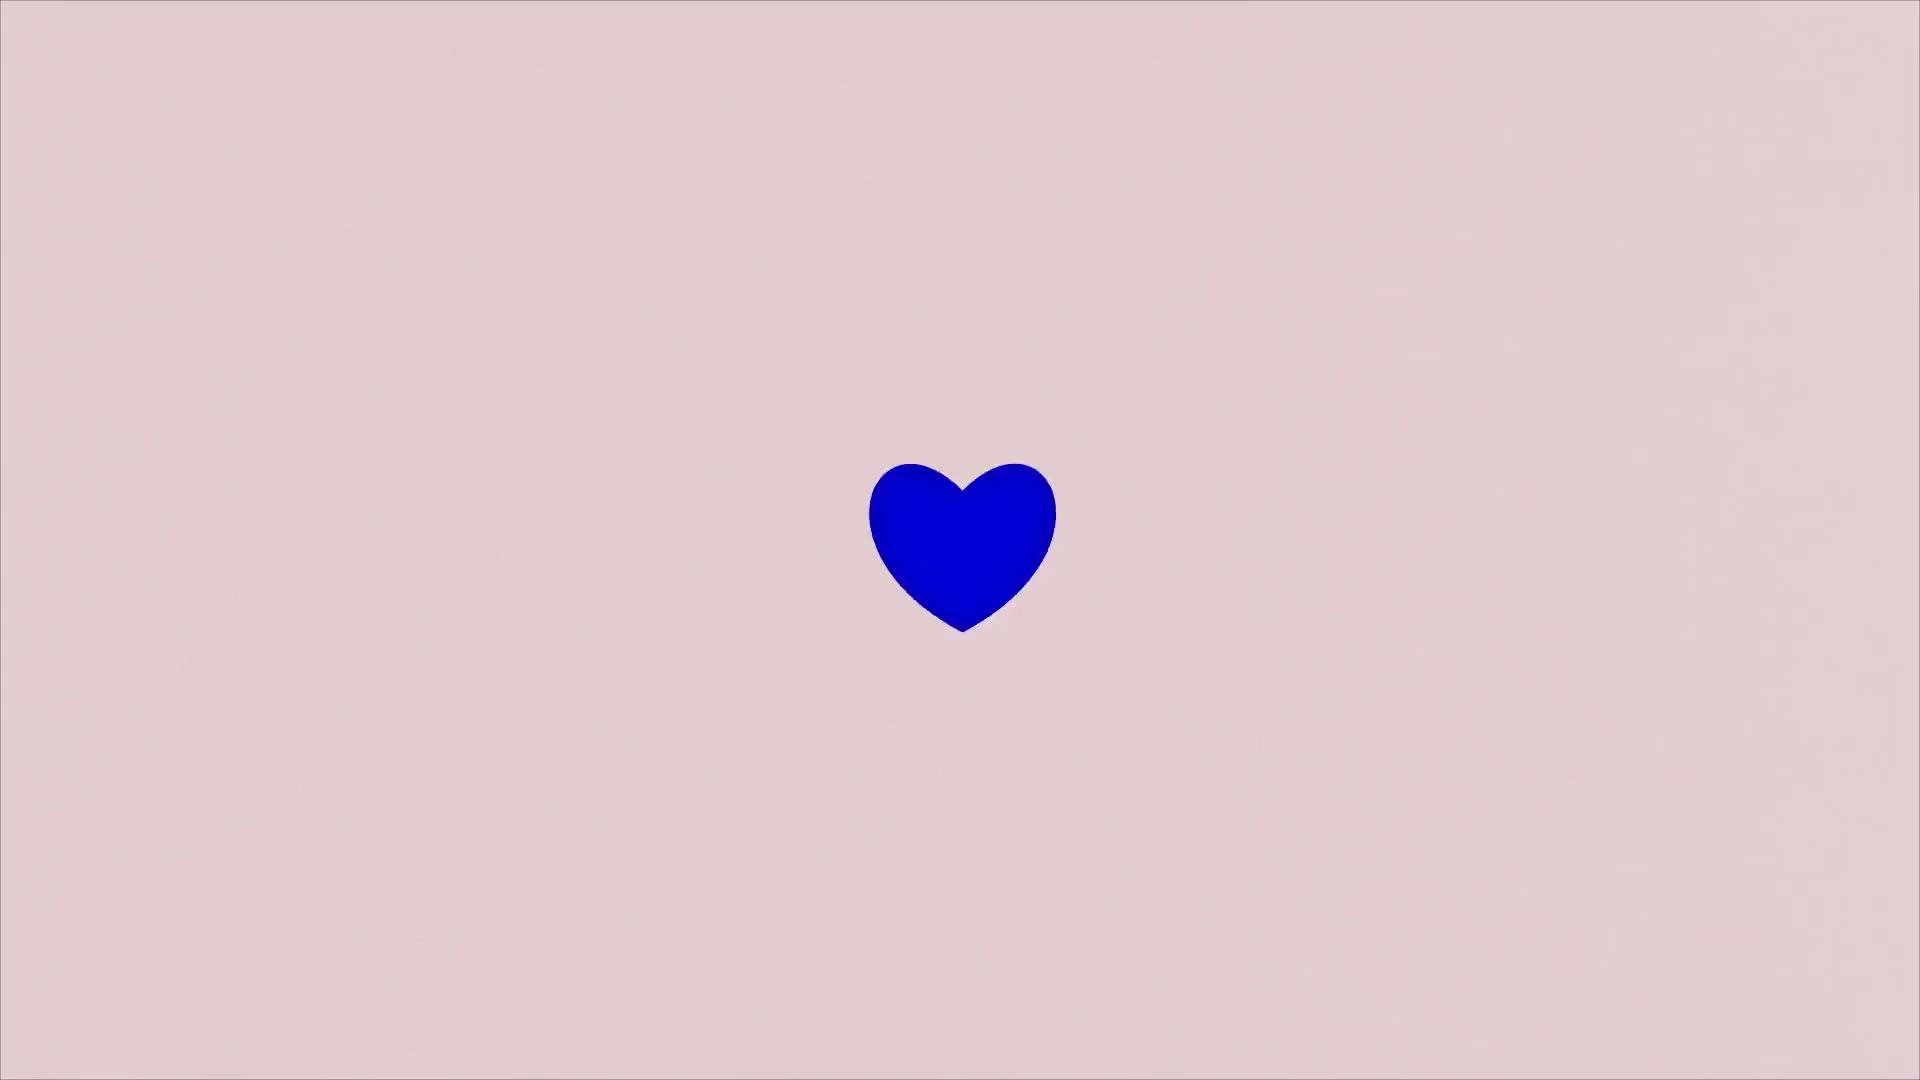 flowers, heart, hearts, i love you, love, sidlee, Hearts GIFs